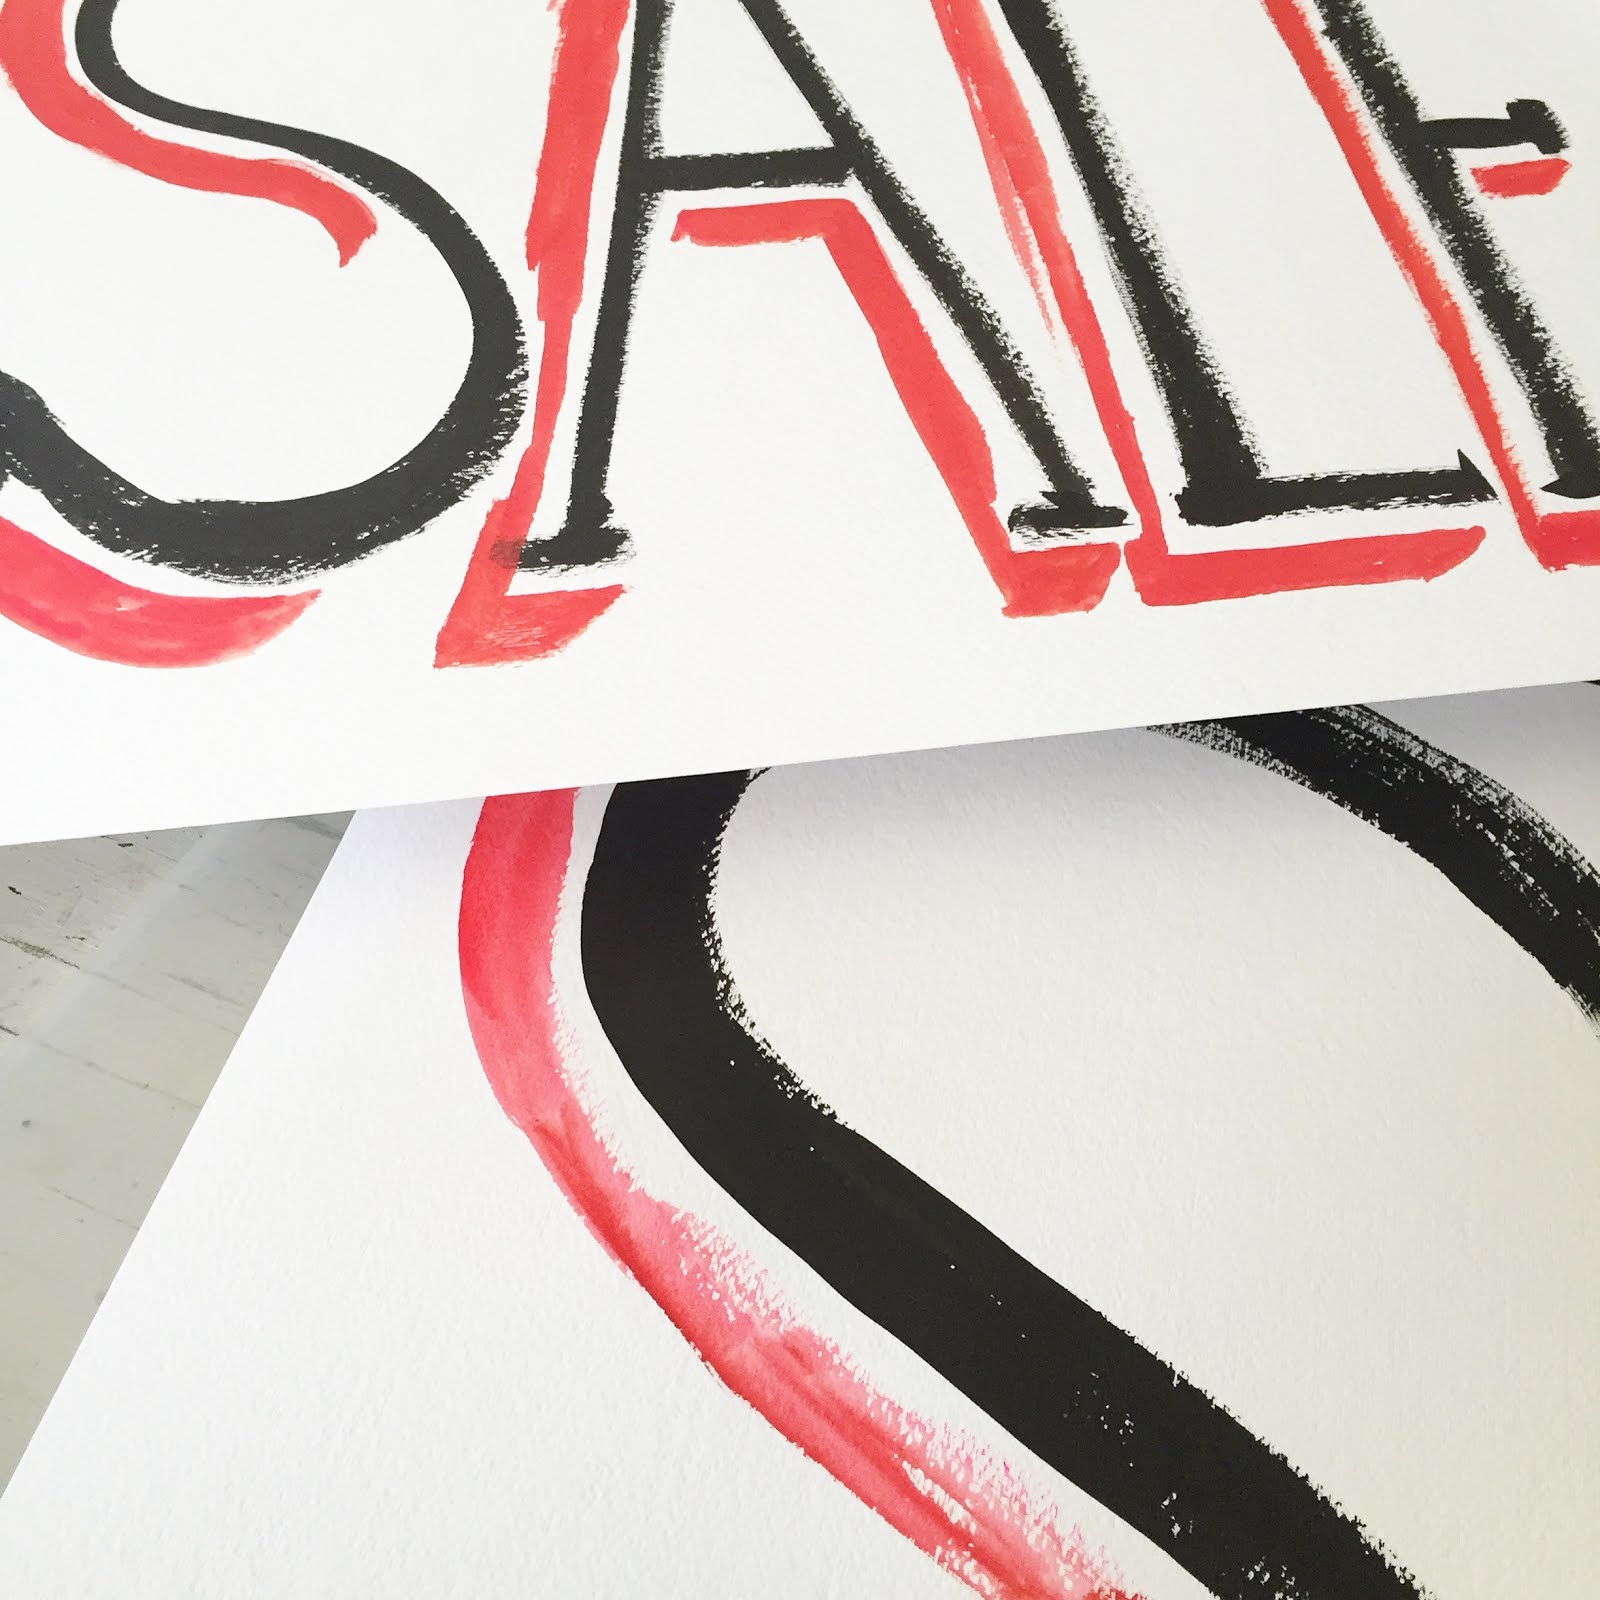 Sale is STILL on!